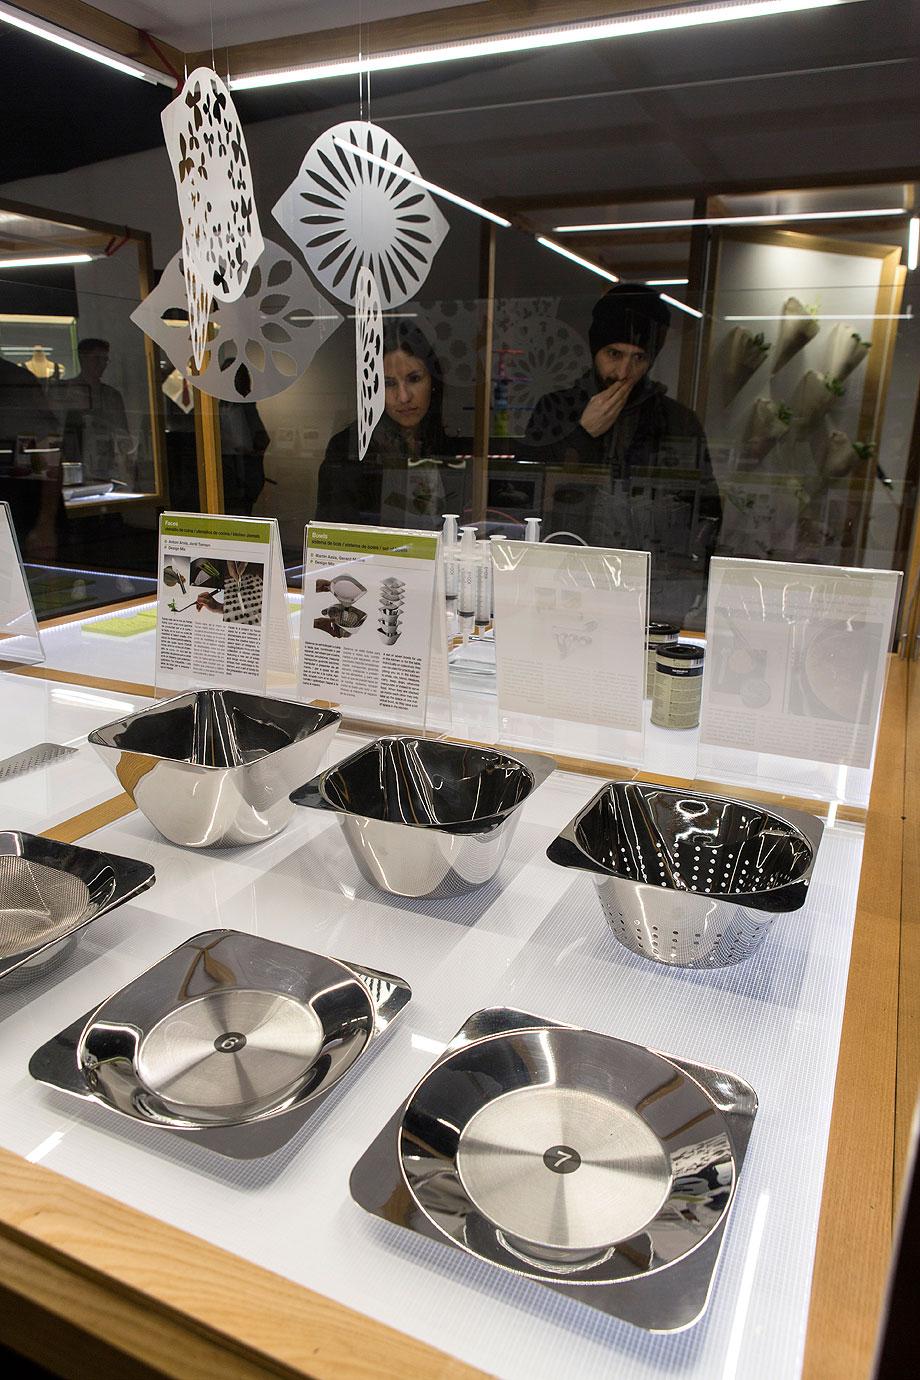 exposicion-tapa-spanish-design-for-food-museo-del-diseño-barcelona (5)